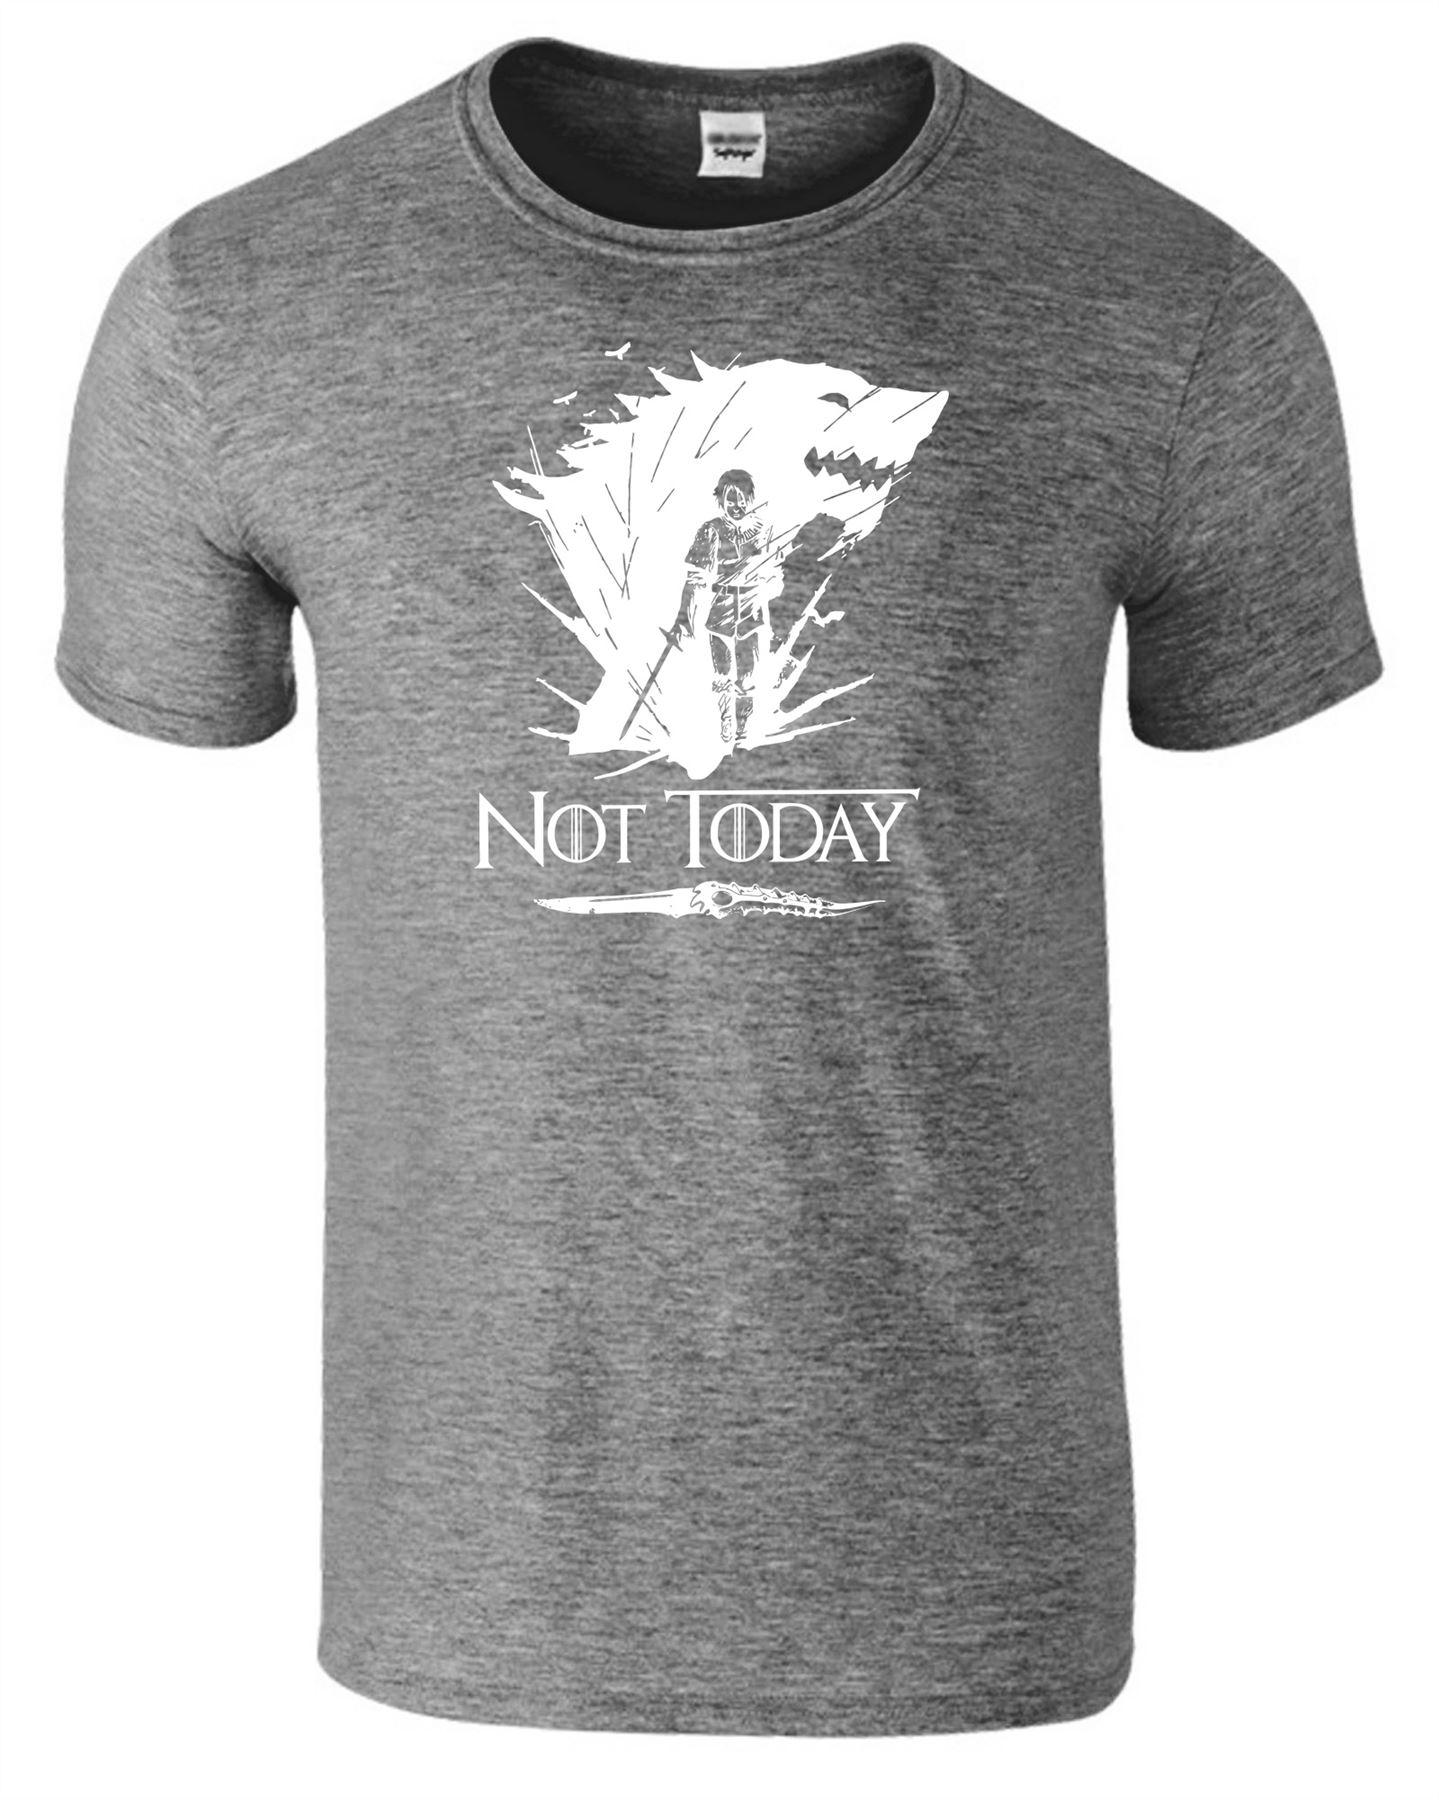 Arya-Stark-Not-Today-T-Shirt-Mens-Game-Season-Womens-Shirt-Adults-Unisex-Fit Indexbild 15